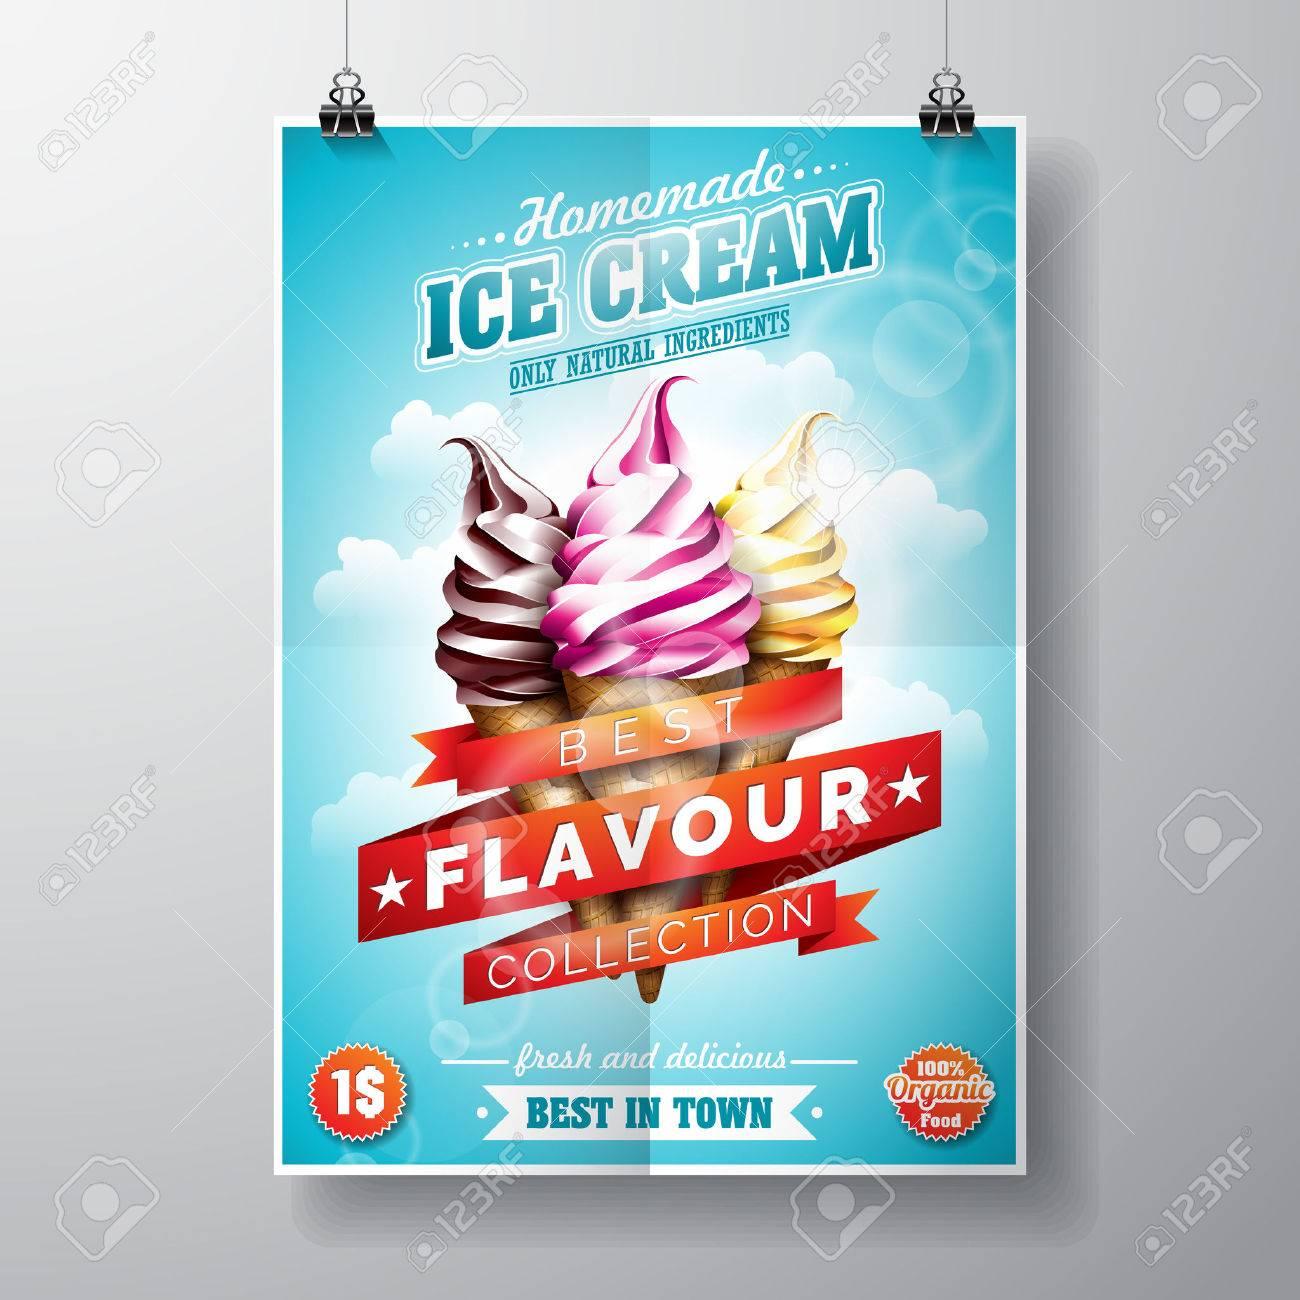 Delicious Ice Cream Design on sky background - 53834139